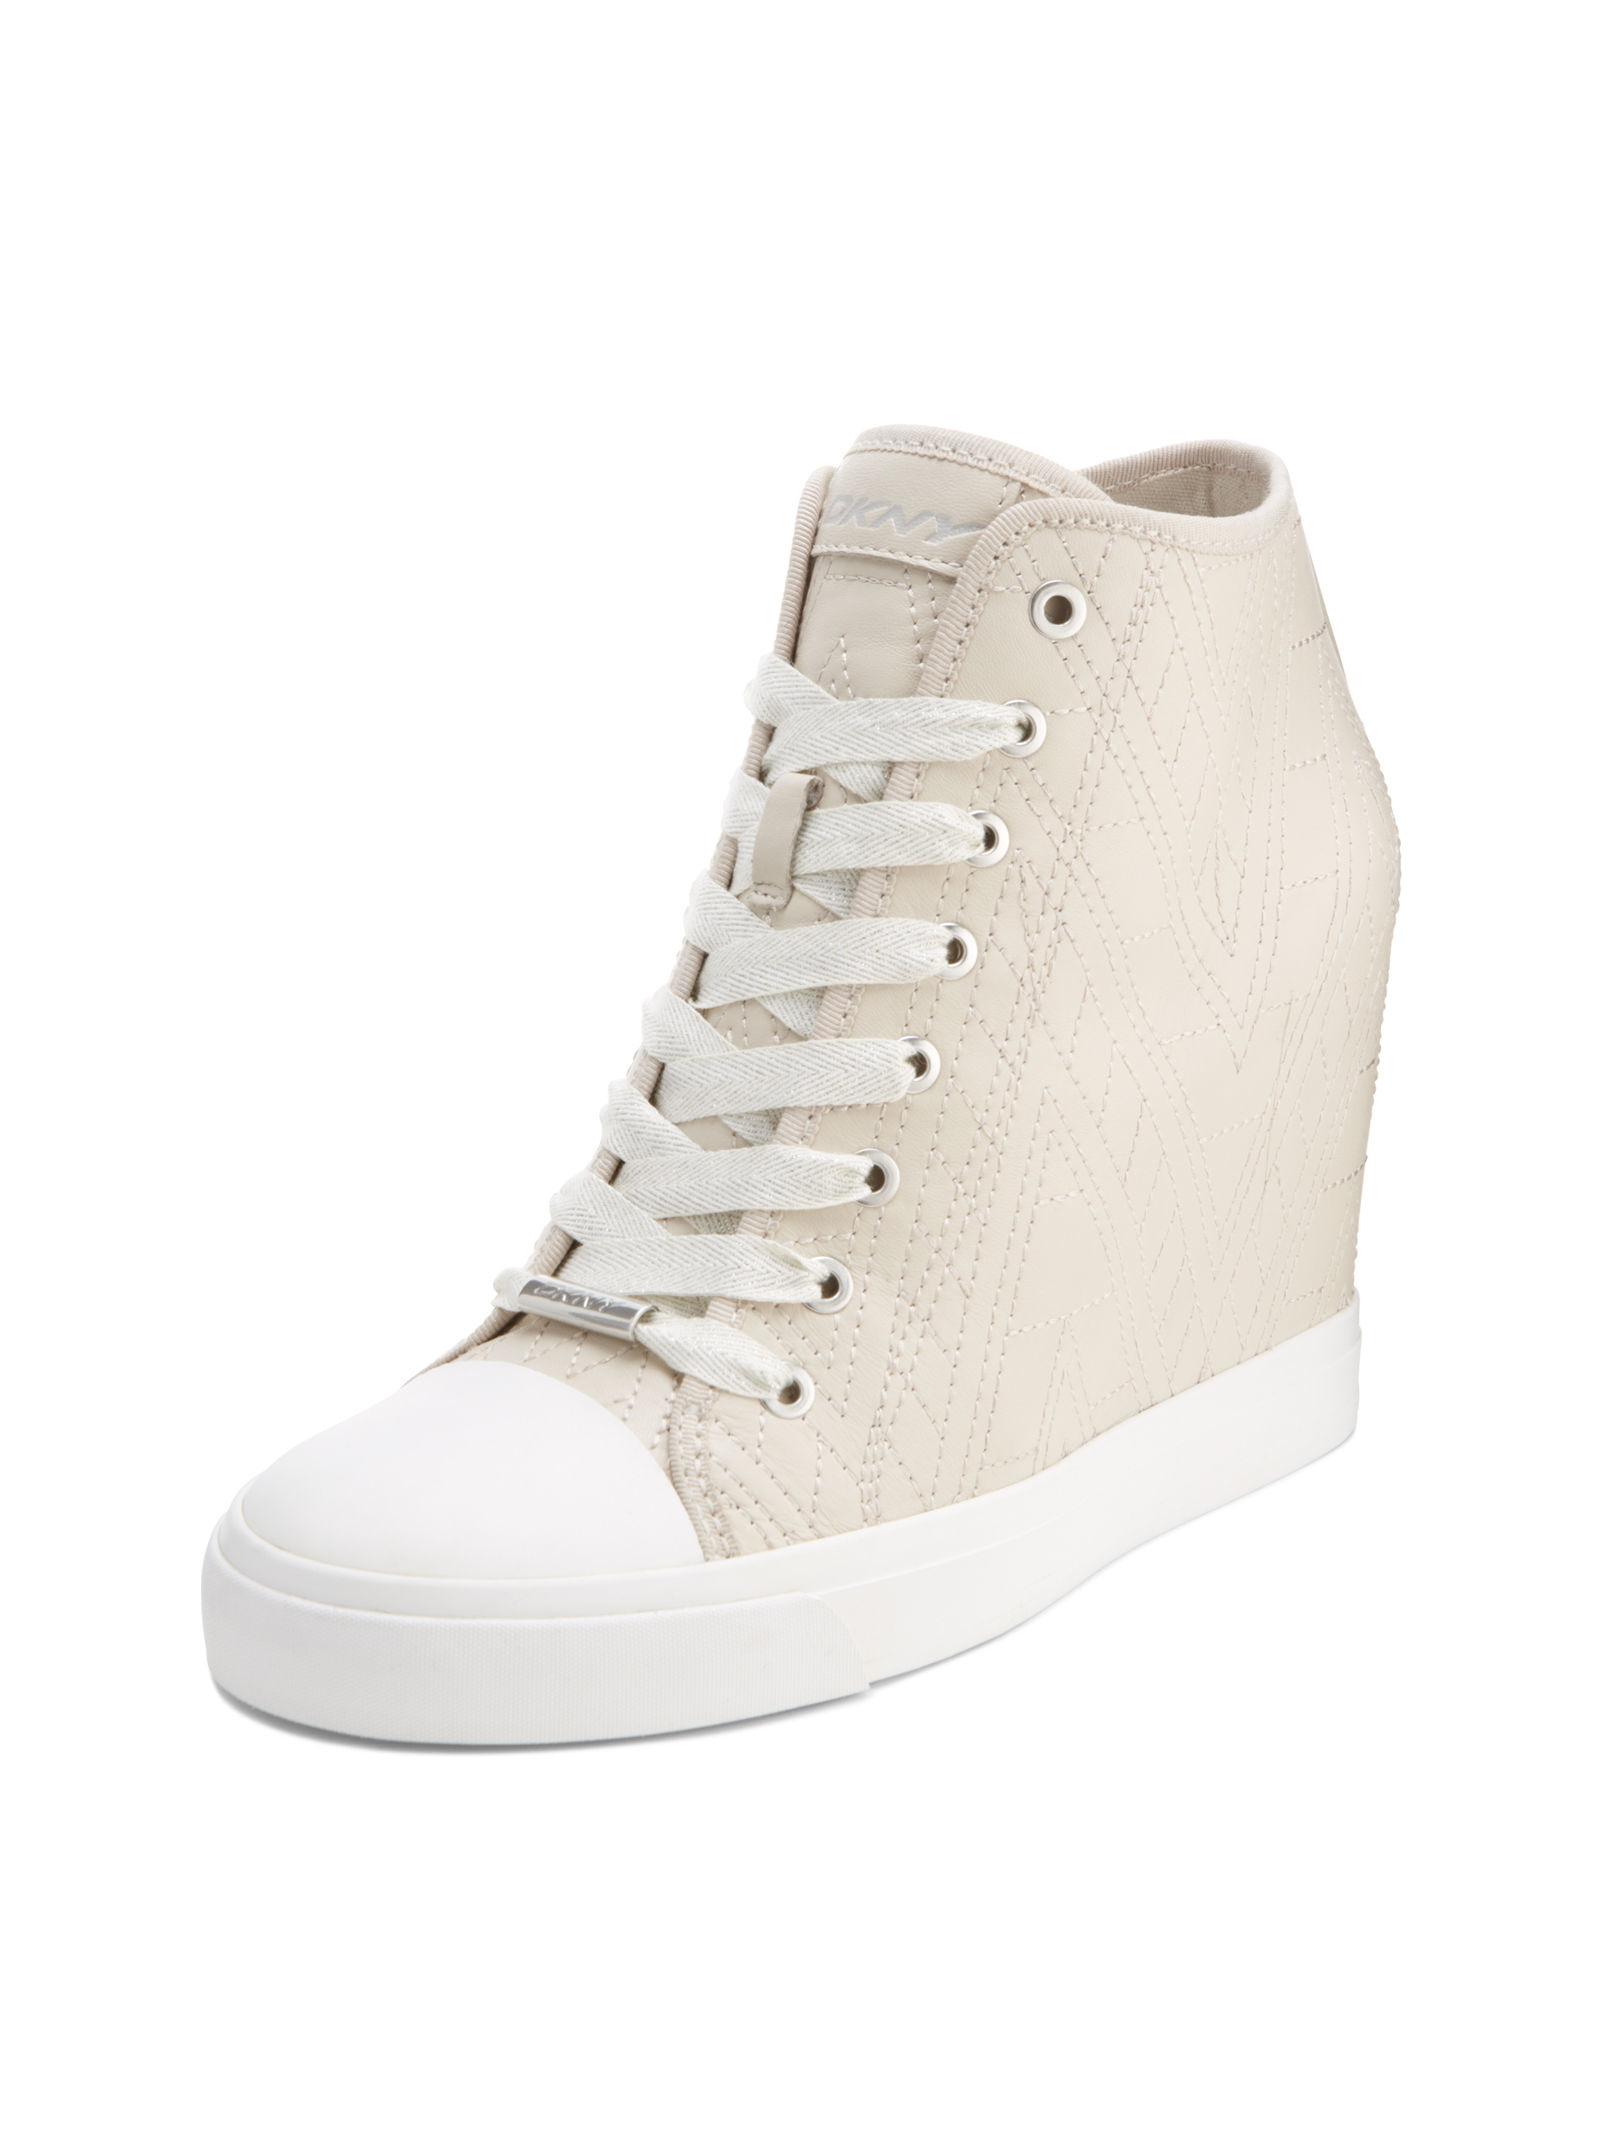 016bb0bb8a88 Lyst - DKNY Grommet Zip Wedge Sneaker in Natural